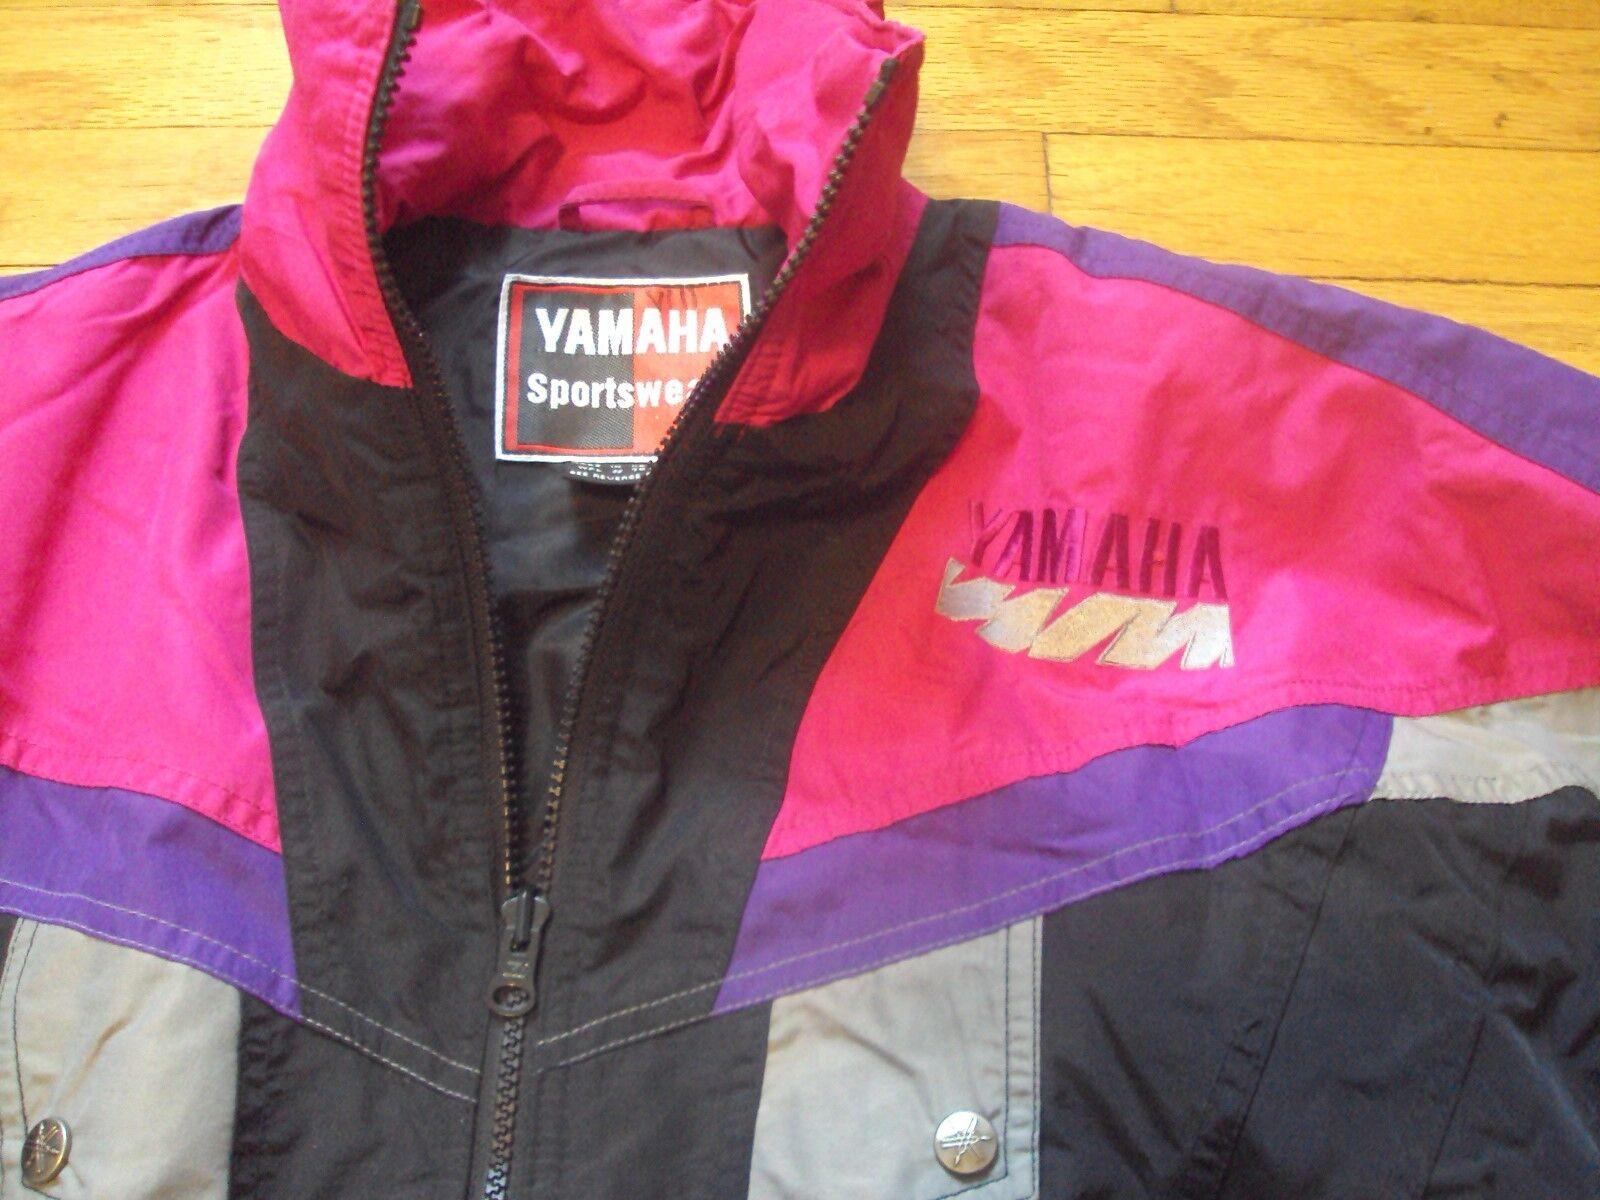 YAMAHA SPORTS WEAR VINTAGE 1990'S PURPLE PINK RETRO SNOWMOBILE SKI SNOWBOARD